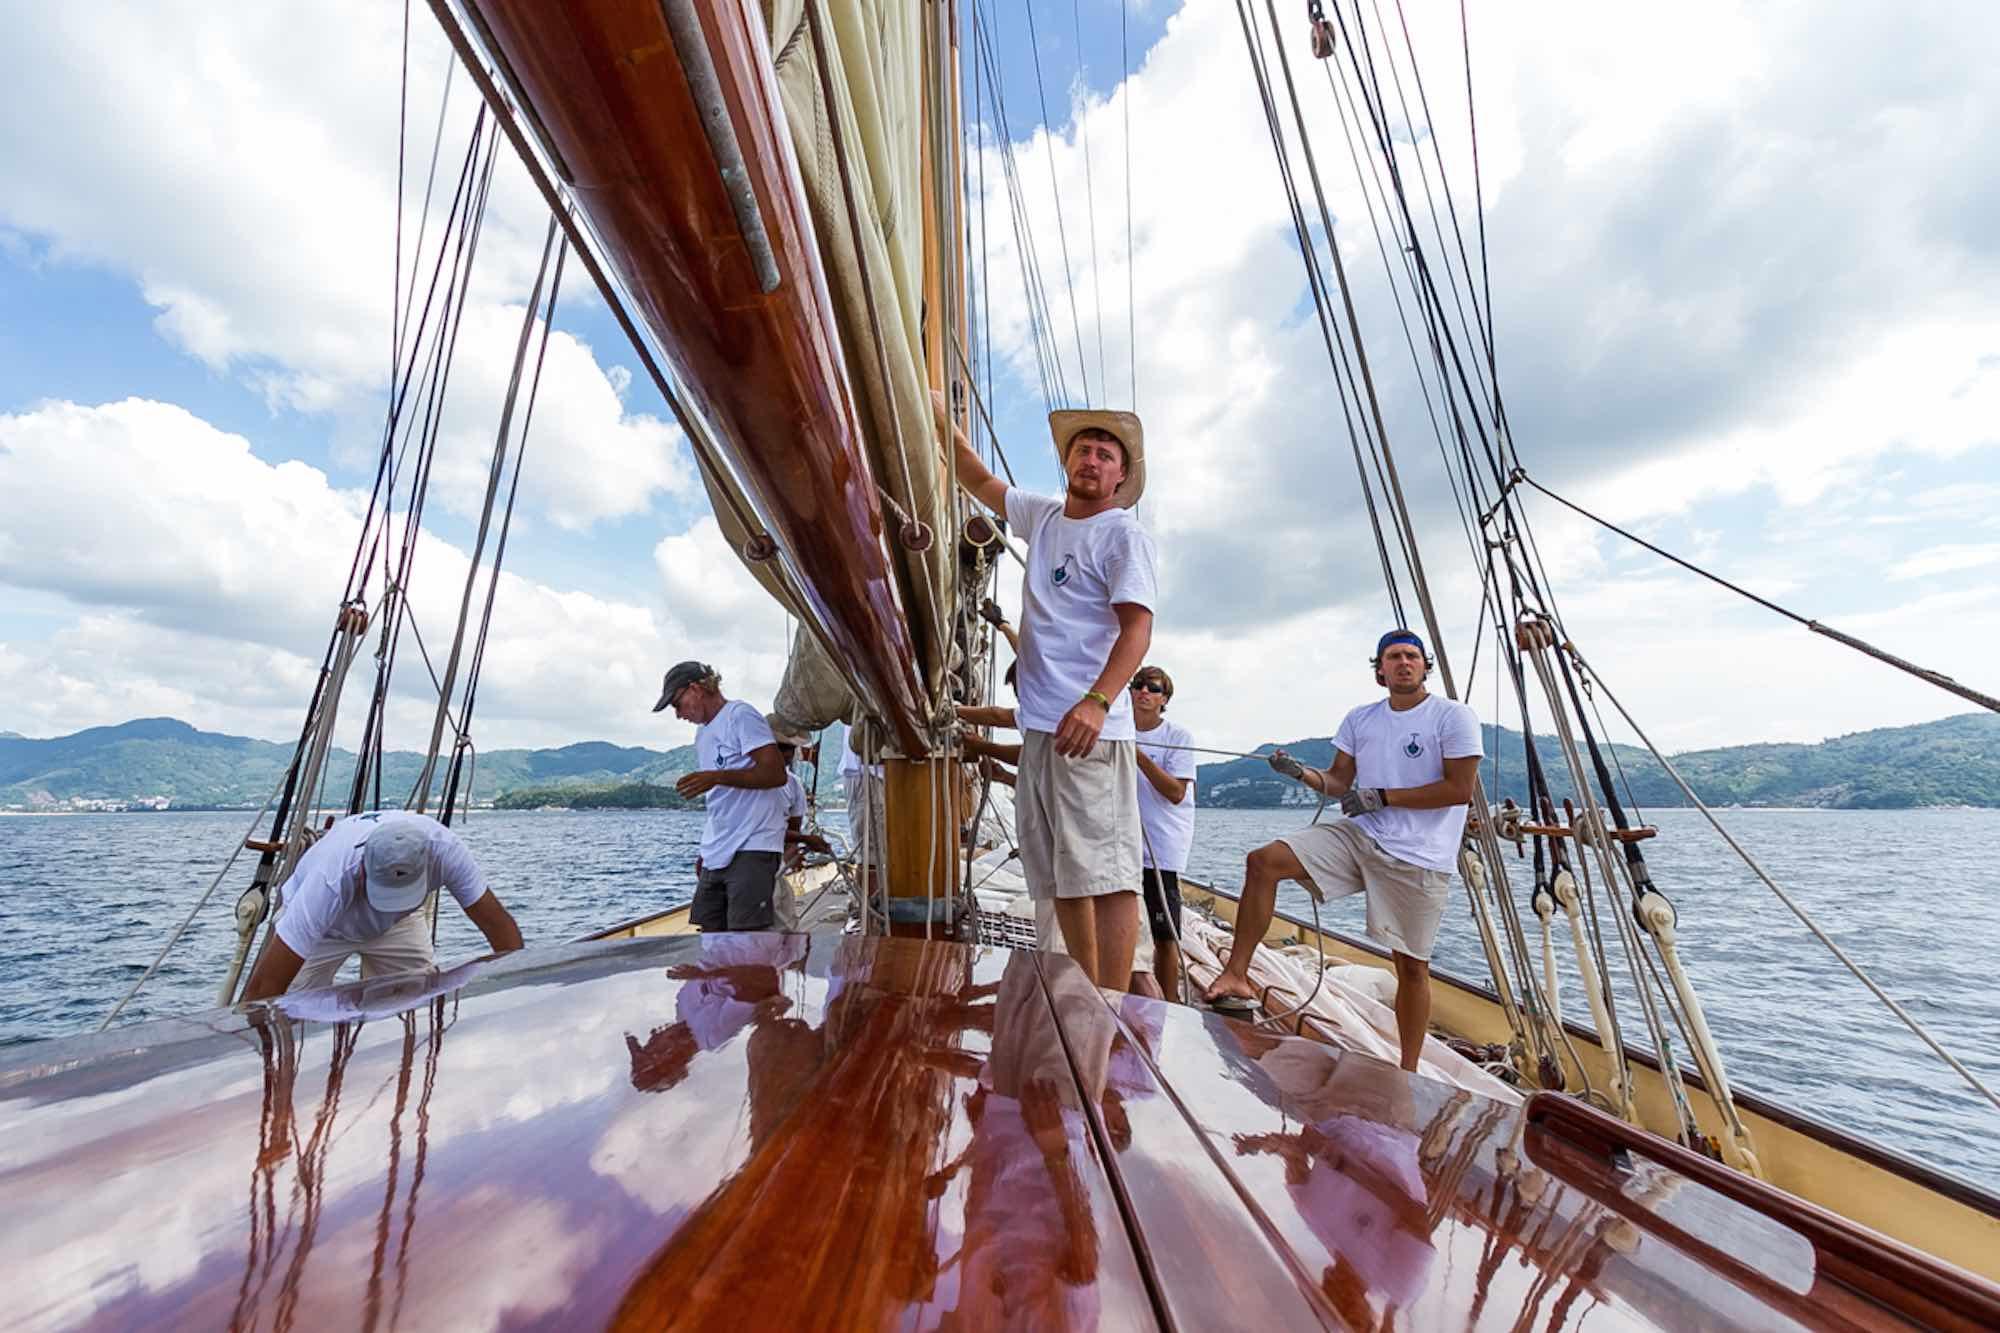 asia superyacht rendezvous 2014 sunshine (6).jpeg